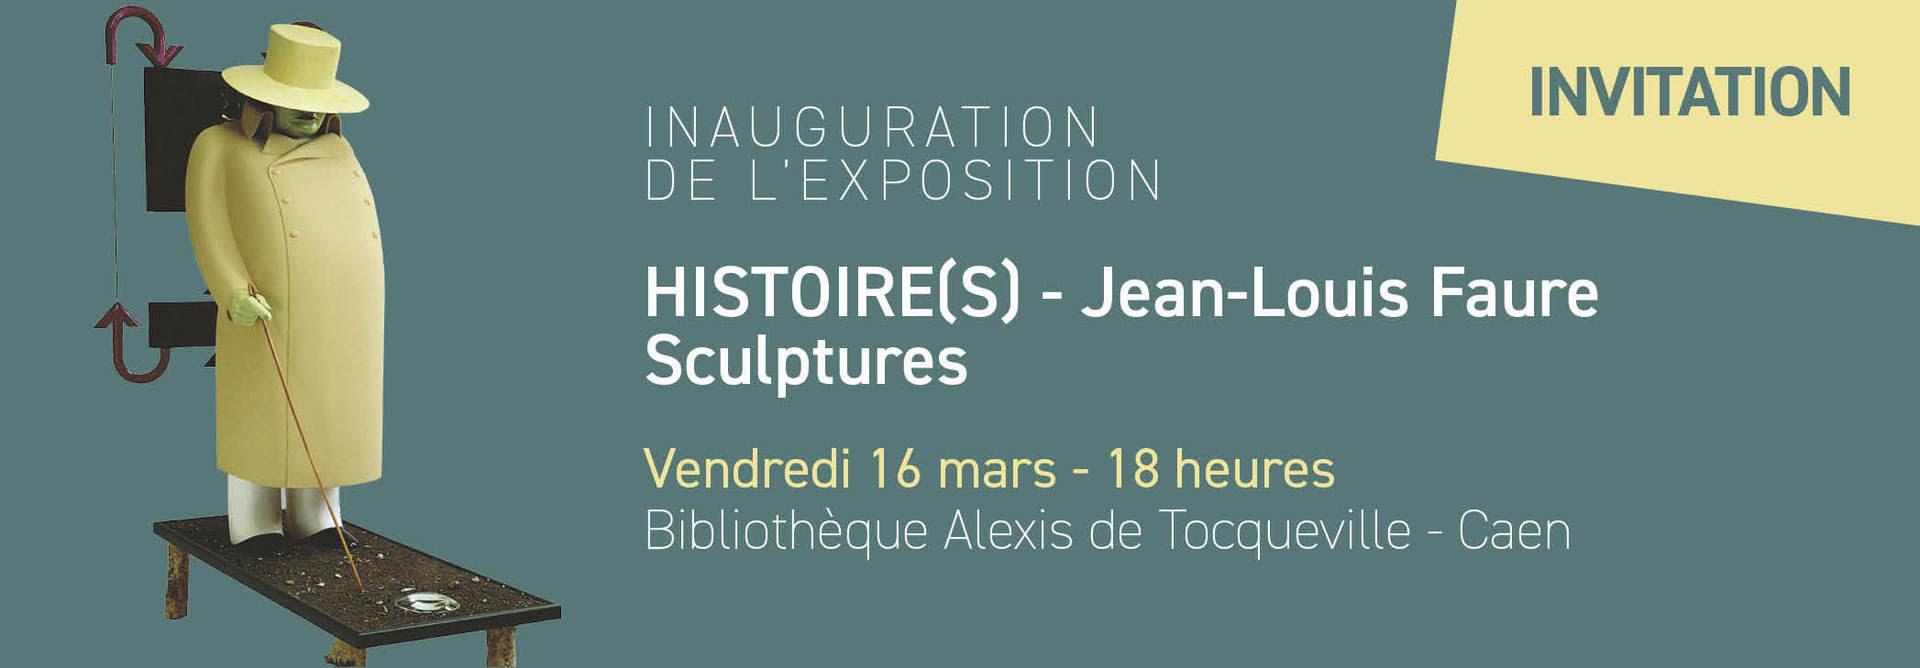 Invitation - Jean-Louis Faure